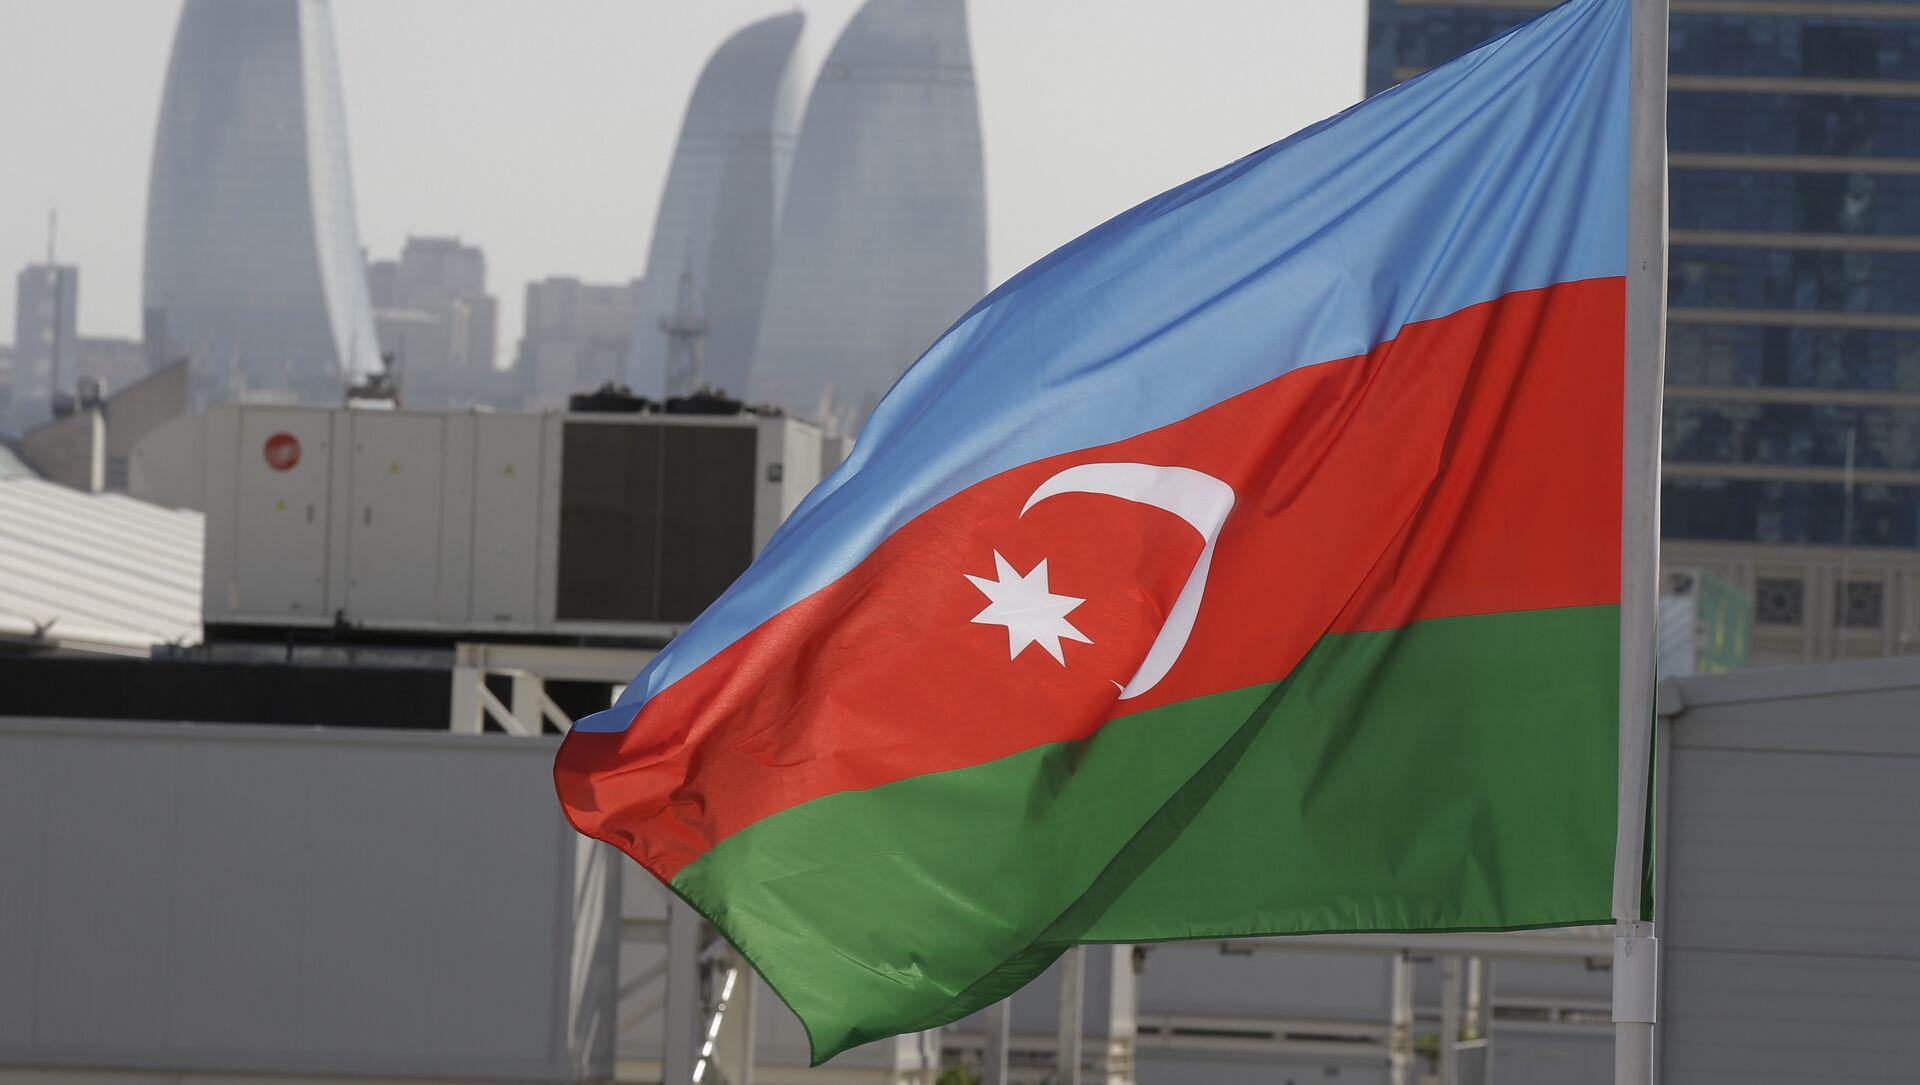 Bandera de Azerbaiyán - Sputnik Mundo, 1920, 09.02.2021